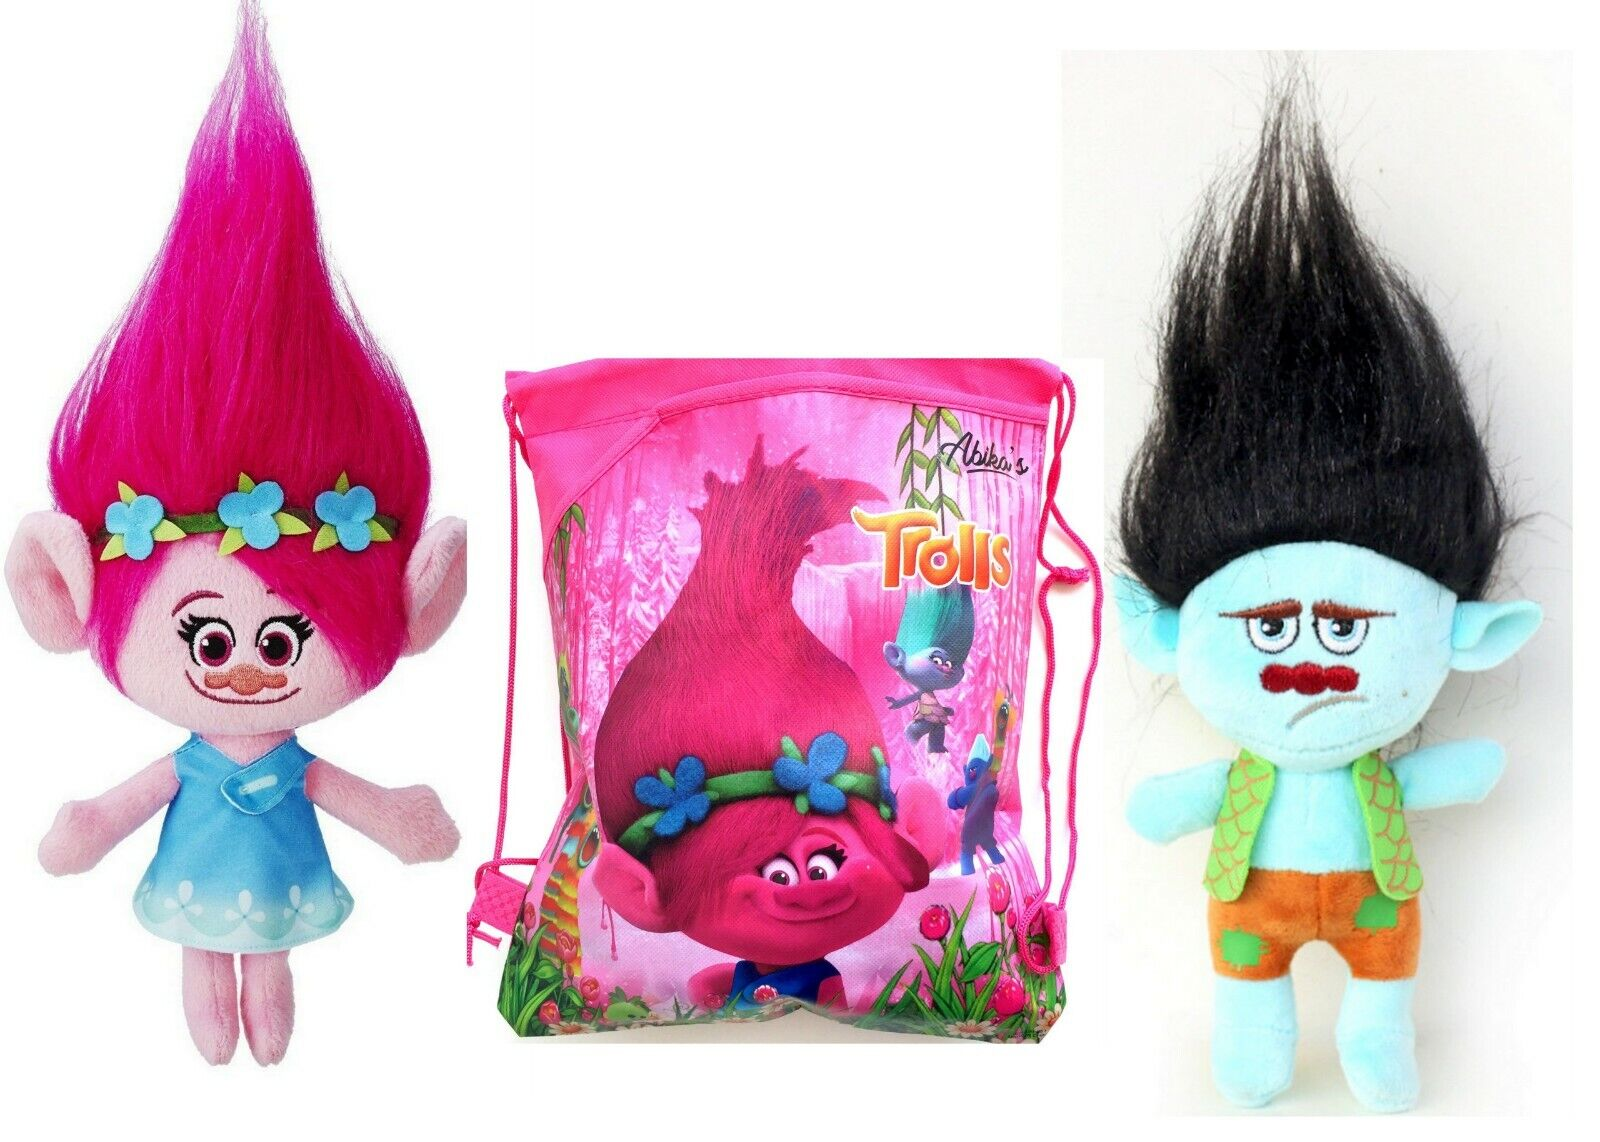 Trolls Poppy Branch Dreamworks Movie 9 Plush Dolls Comes In Bag Fast Shipping Ebay